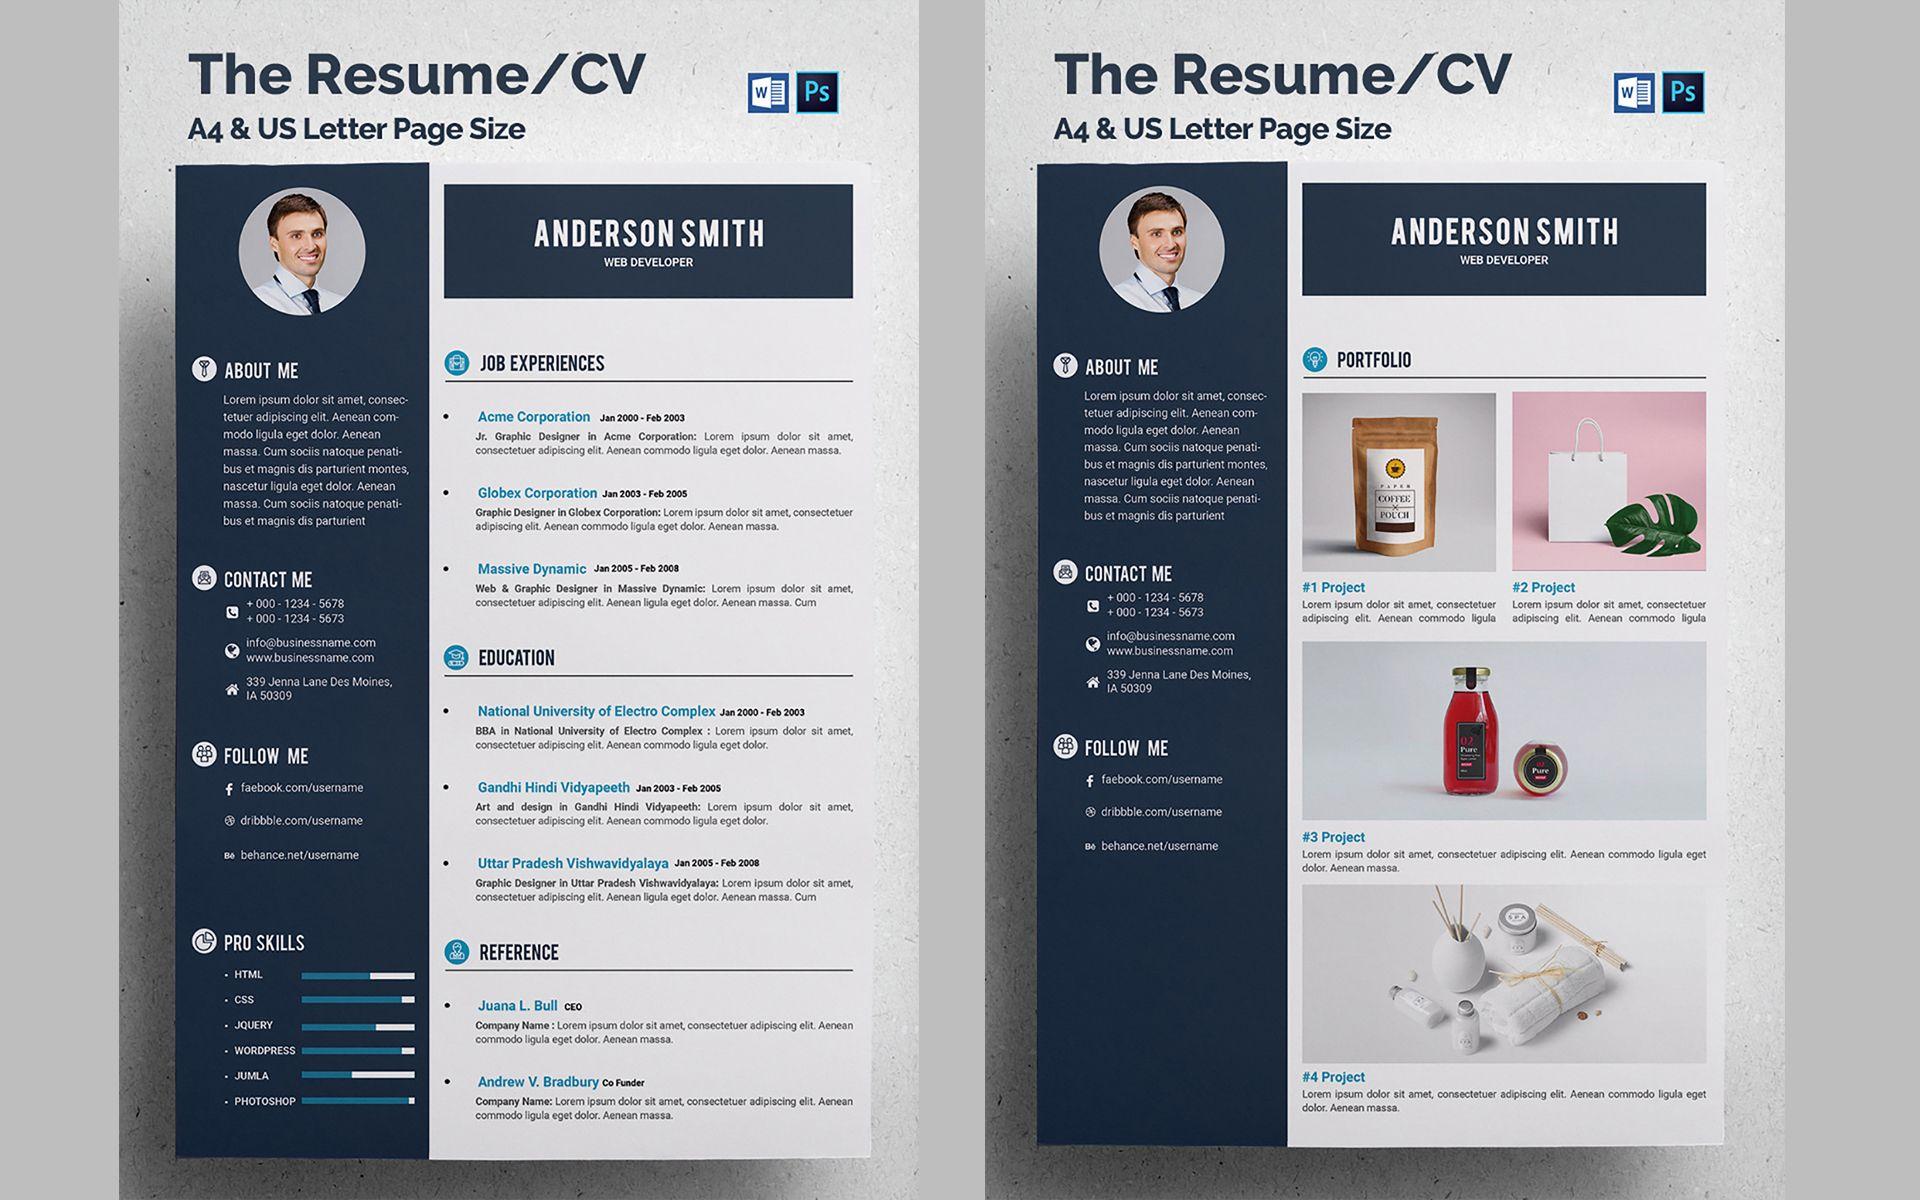 Web Developer Cv Resume Template 68317 Cv Resume Template Web